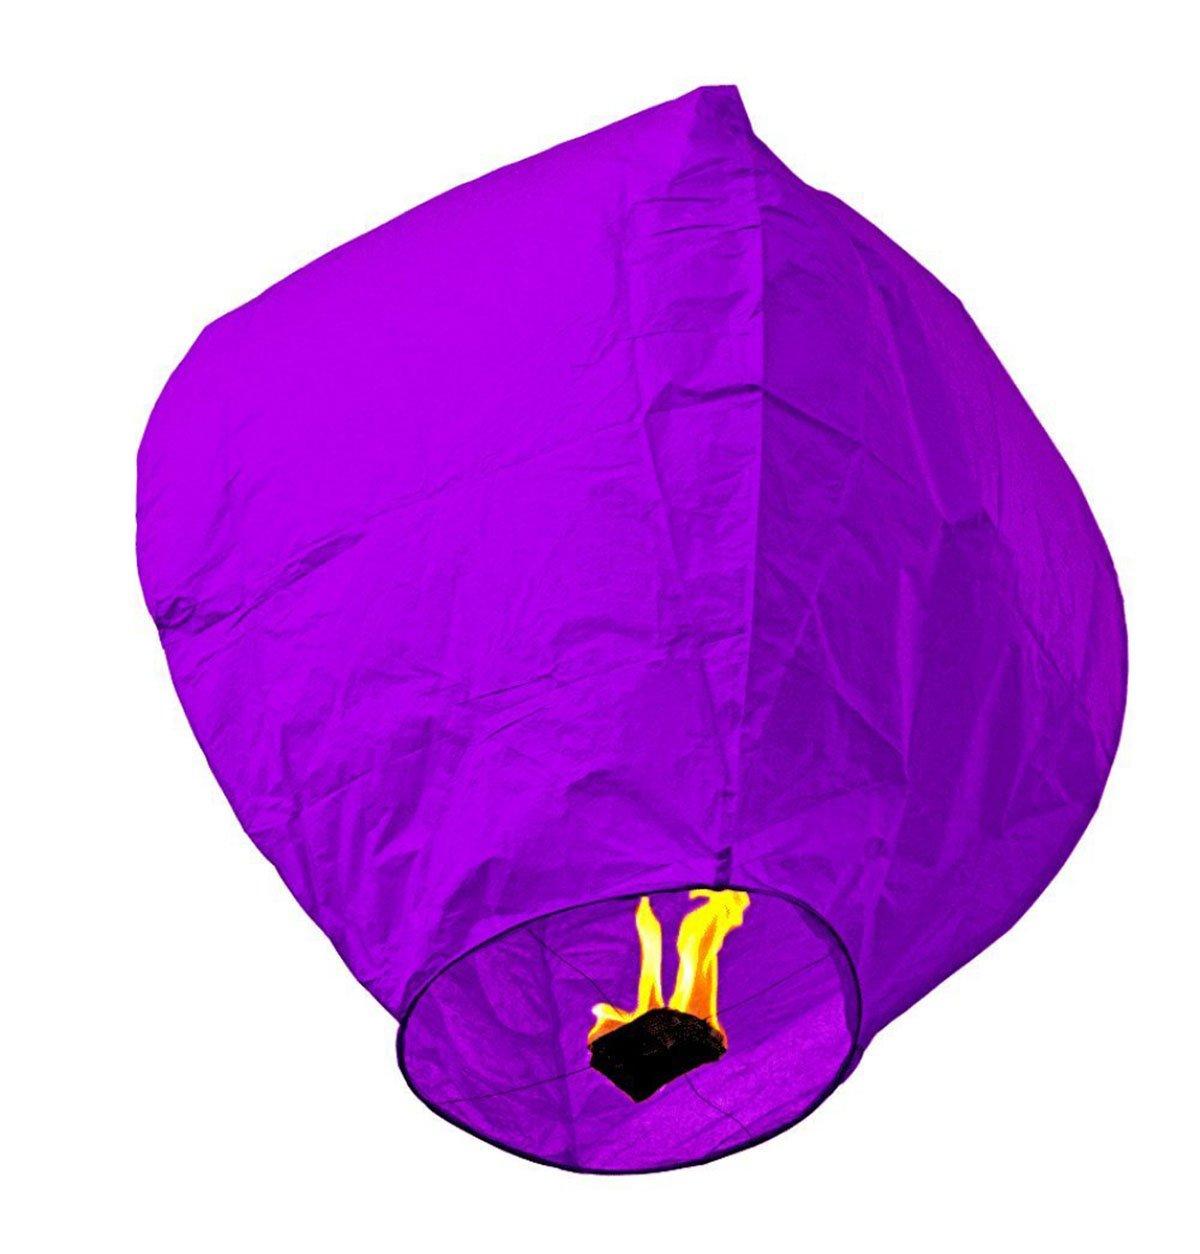 Rainbow Love 10 Pack Chinese Sky Lanterns Wish Balloon Wishing Lamp Wishing Light for Wedding Birthday Christmas Party (Purple)